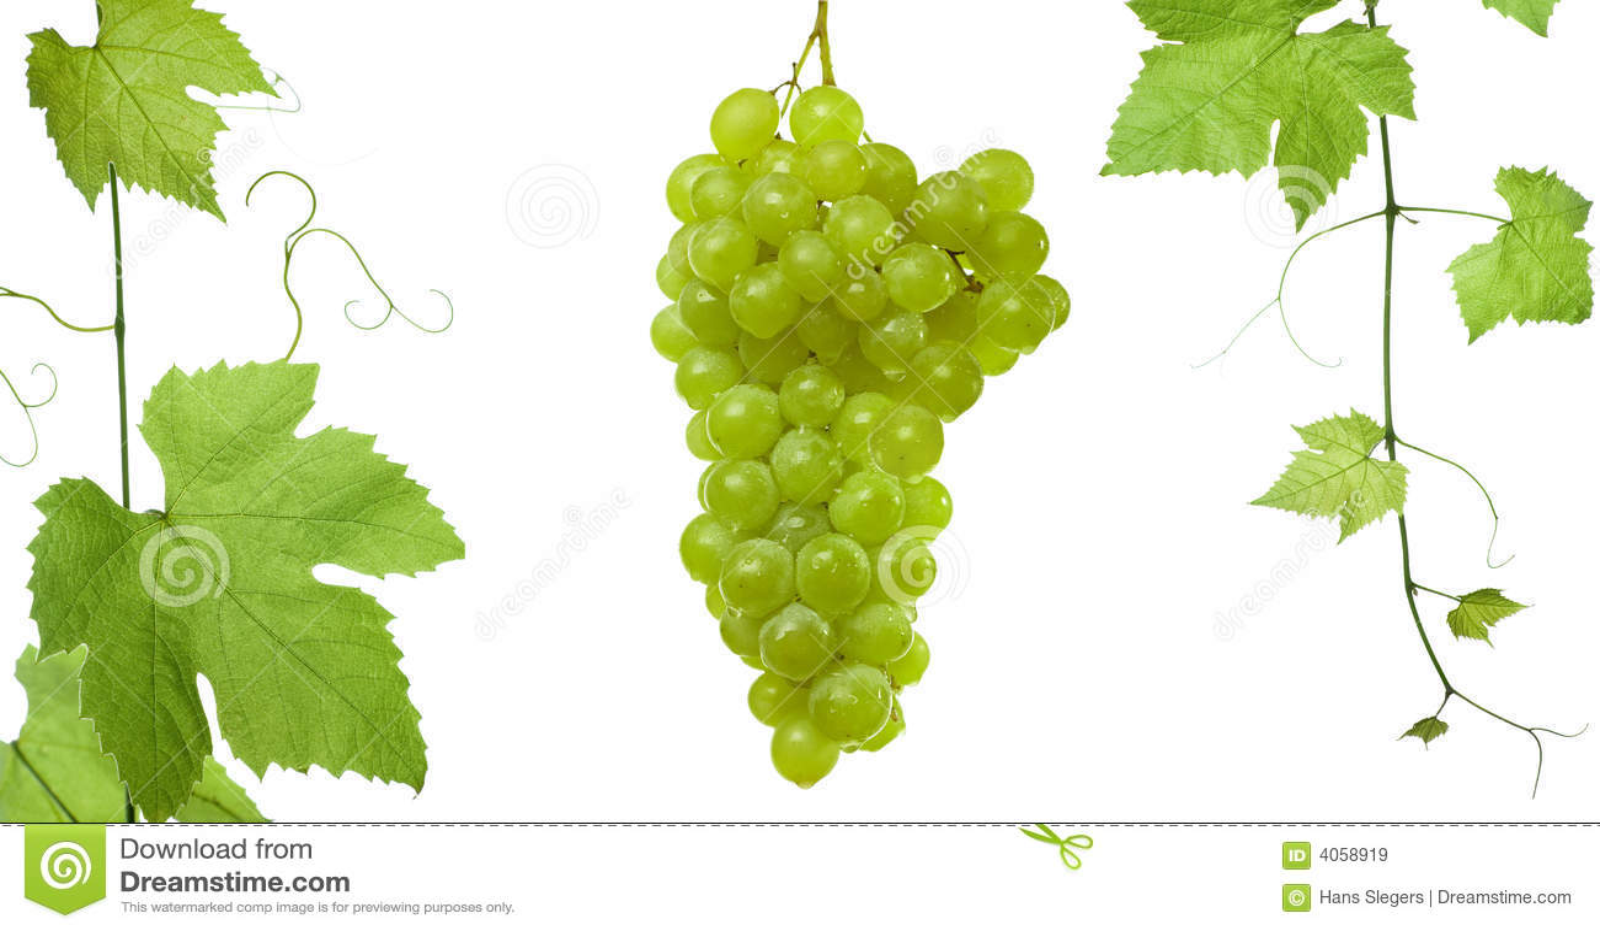 Uva-deixa uvas do ansd